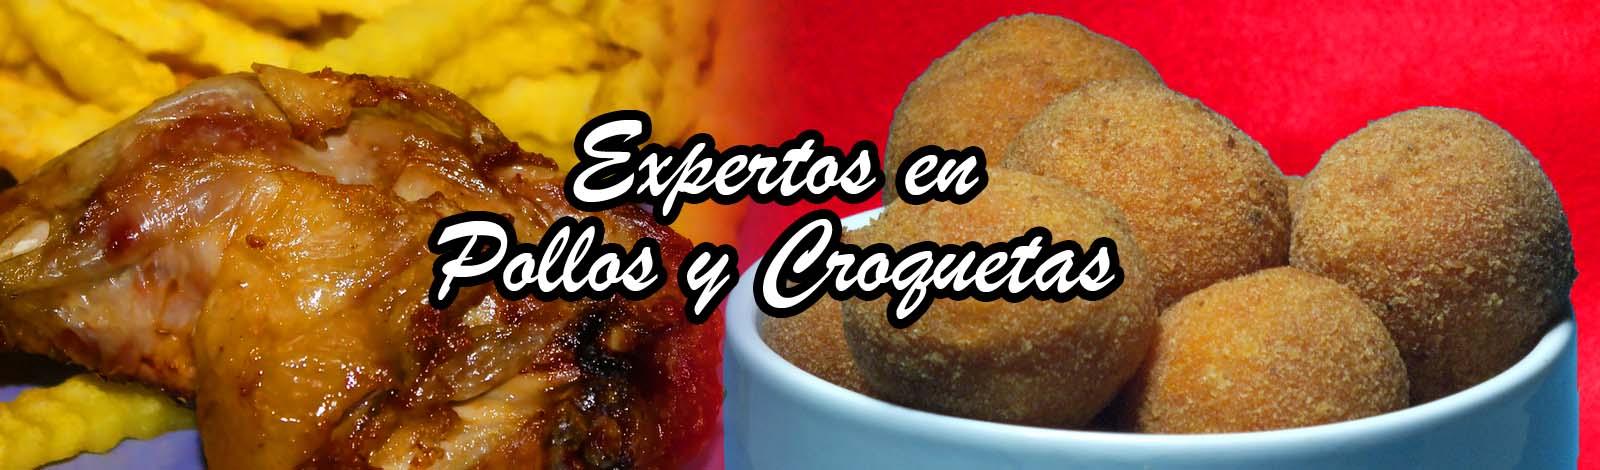 expertos-pollos-croquetas